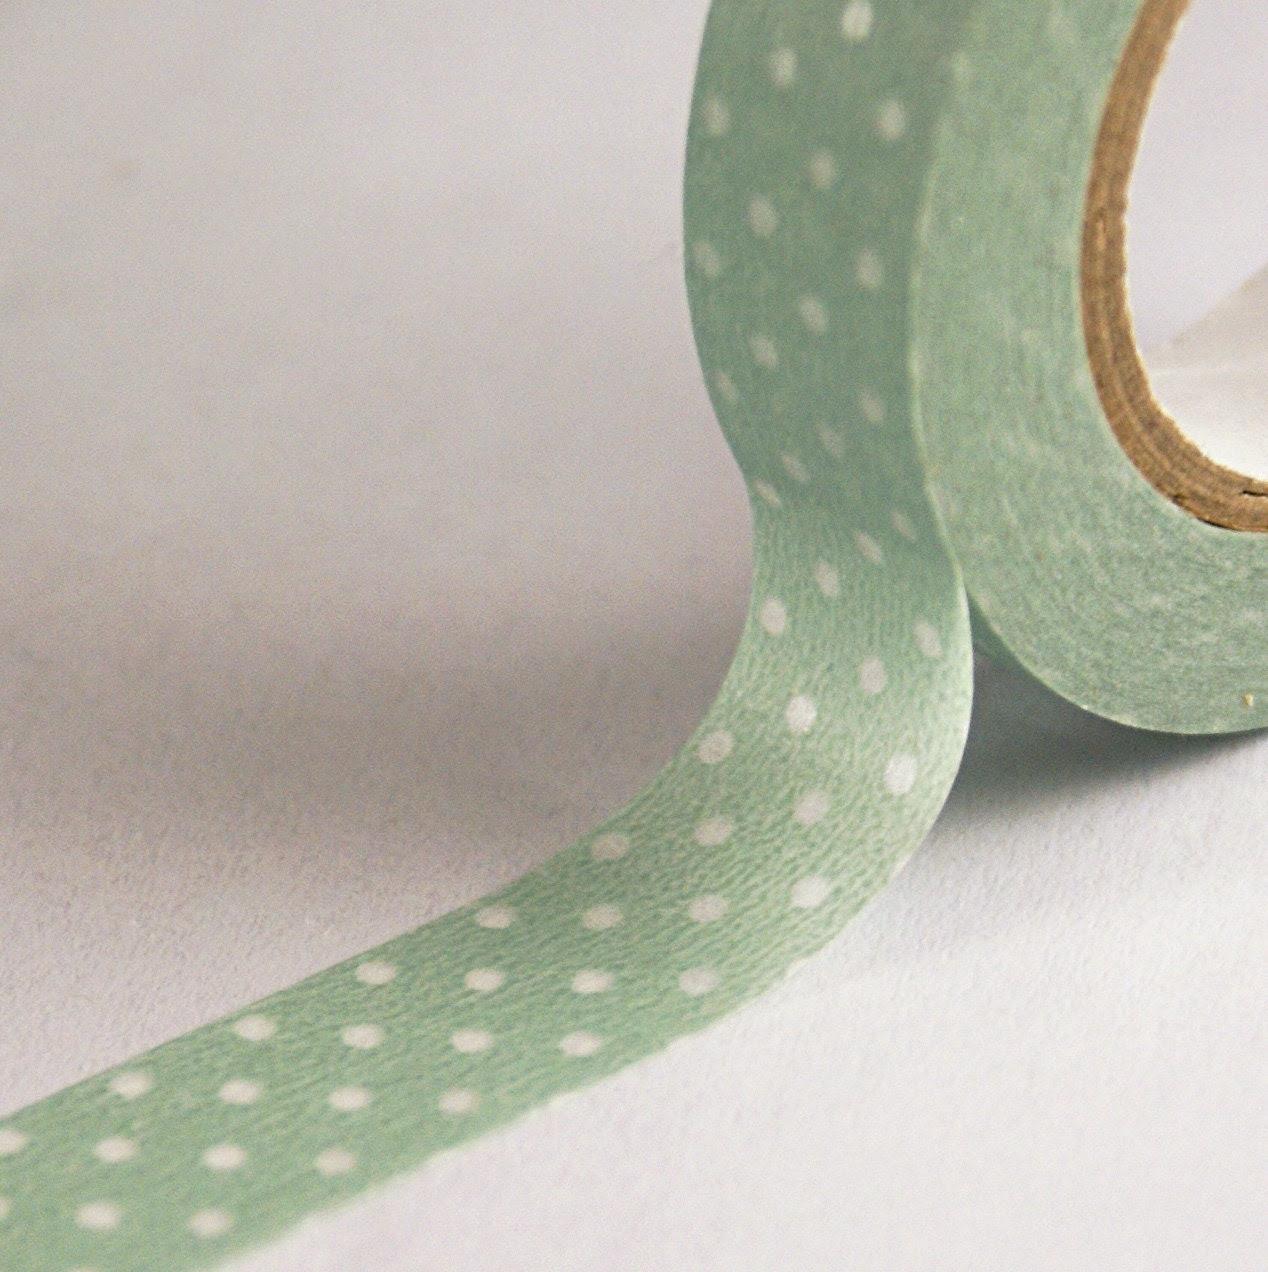 Soft Light Green with Clear Dots Washi Paper Masking Tape-16.5 YARDS - kawaiigoodies